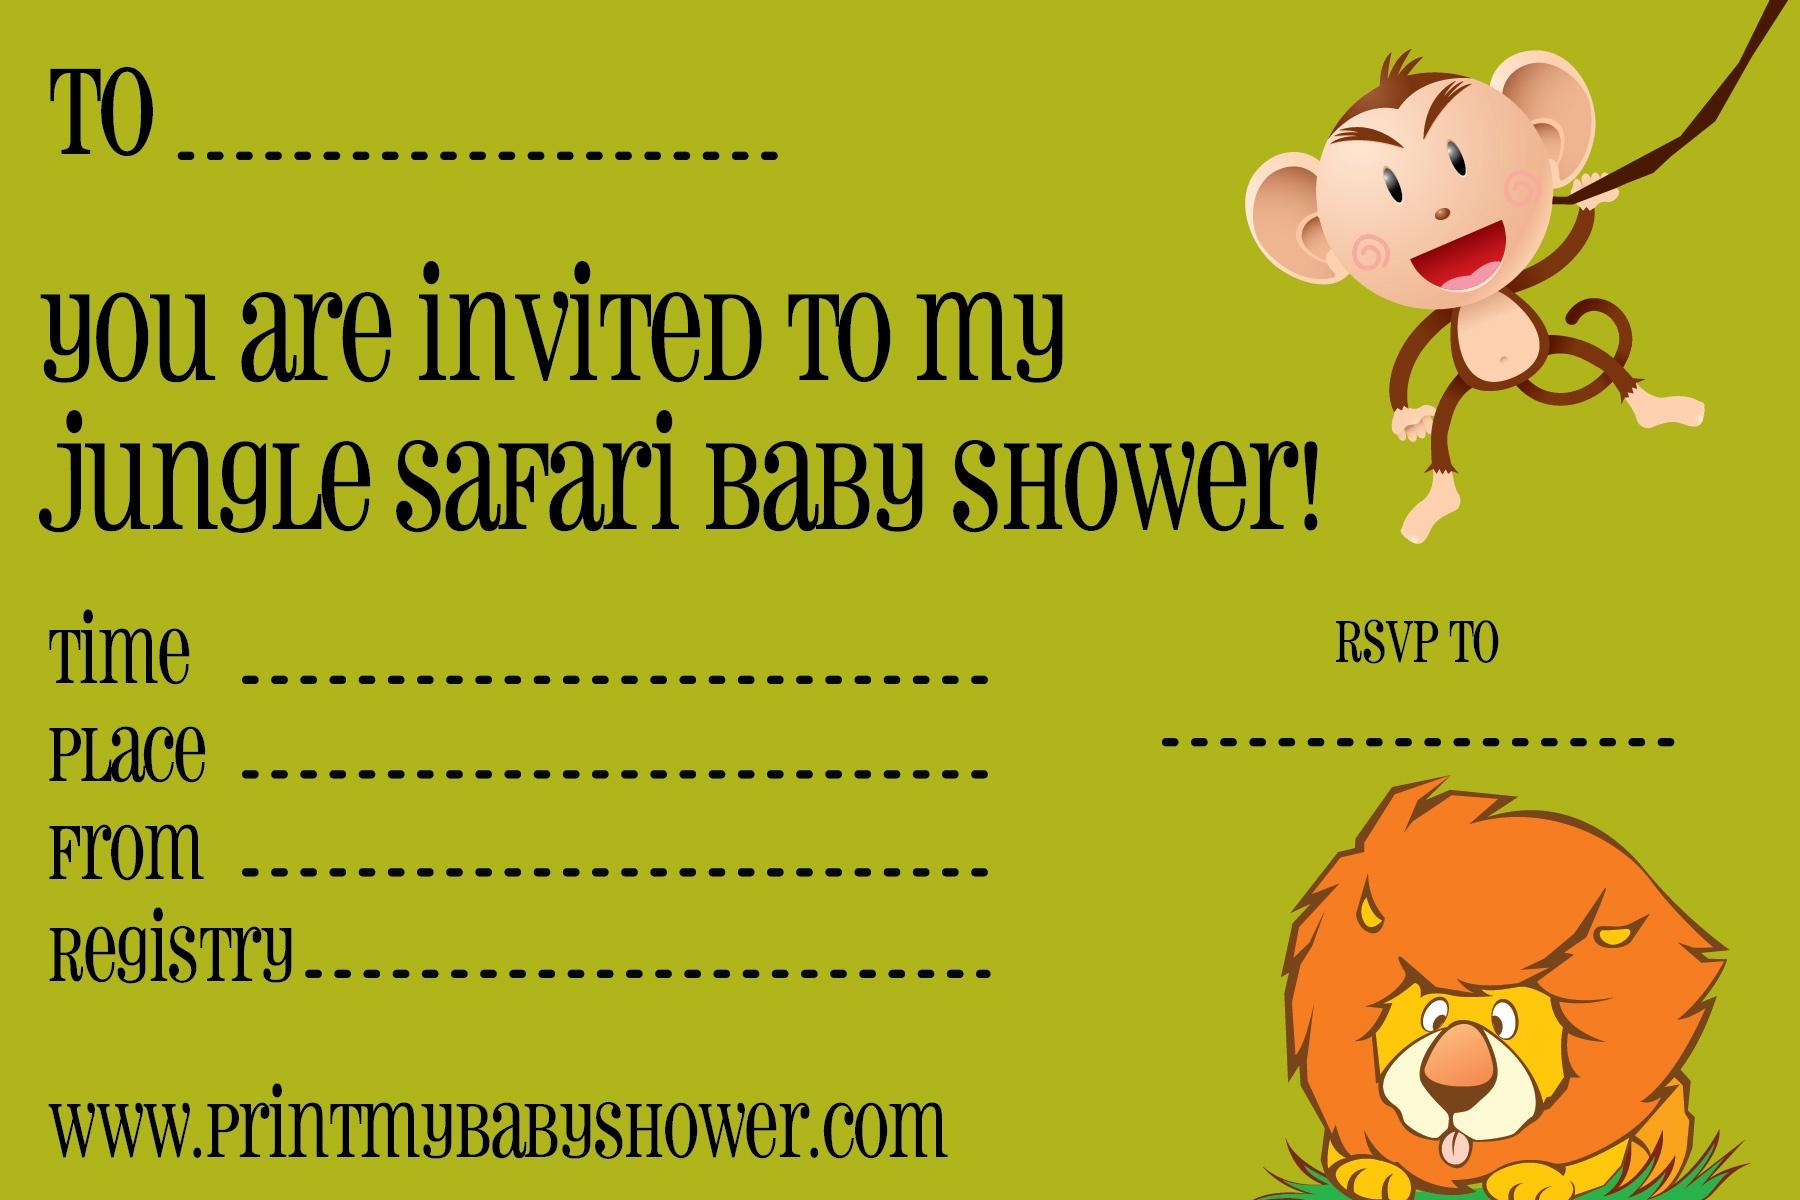 Photo : Dinosaur Baby Shower Sayings Image - Free Printable Dinosaur Baby Shower Invitations